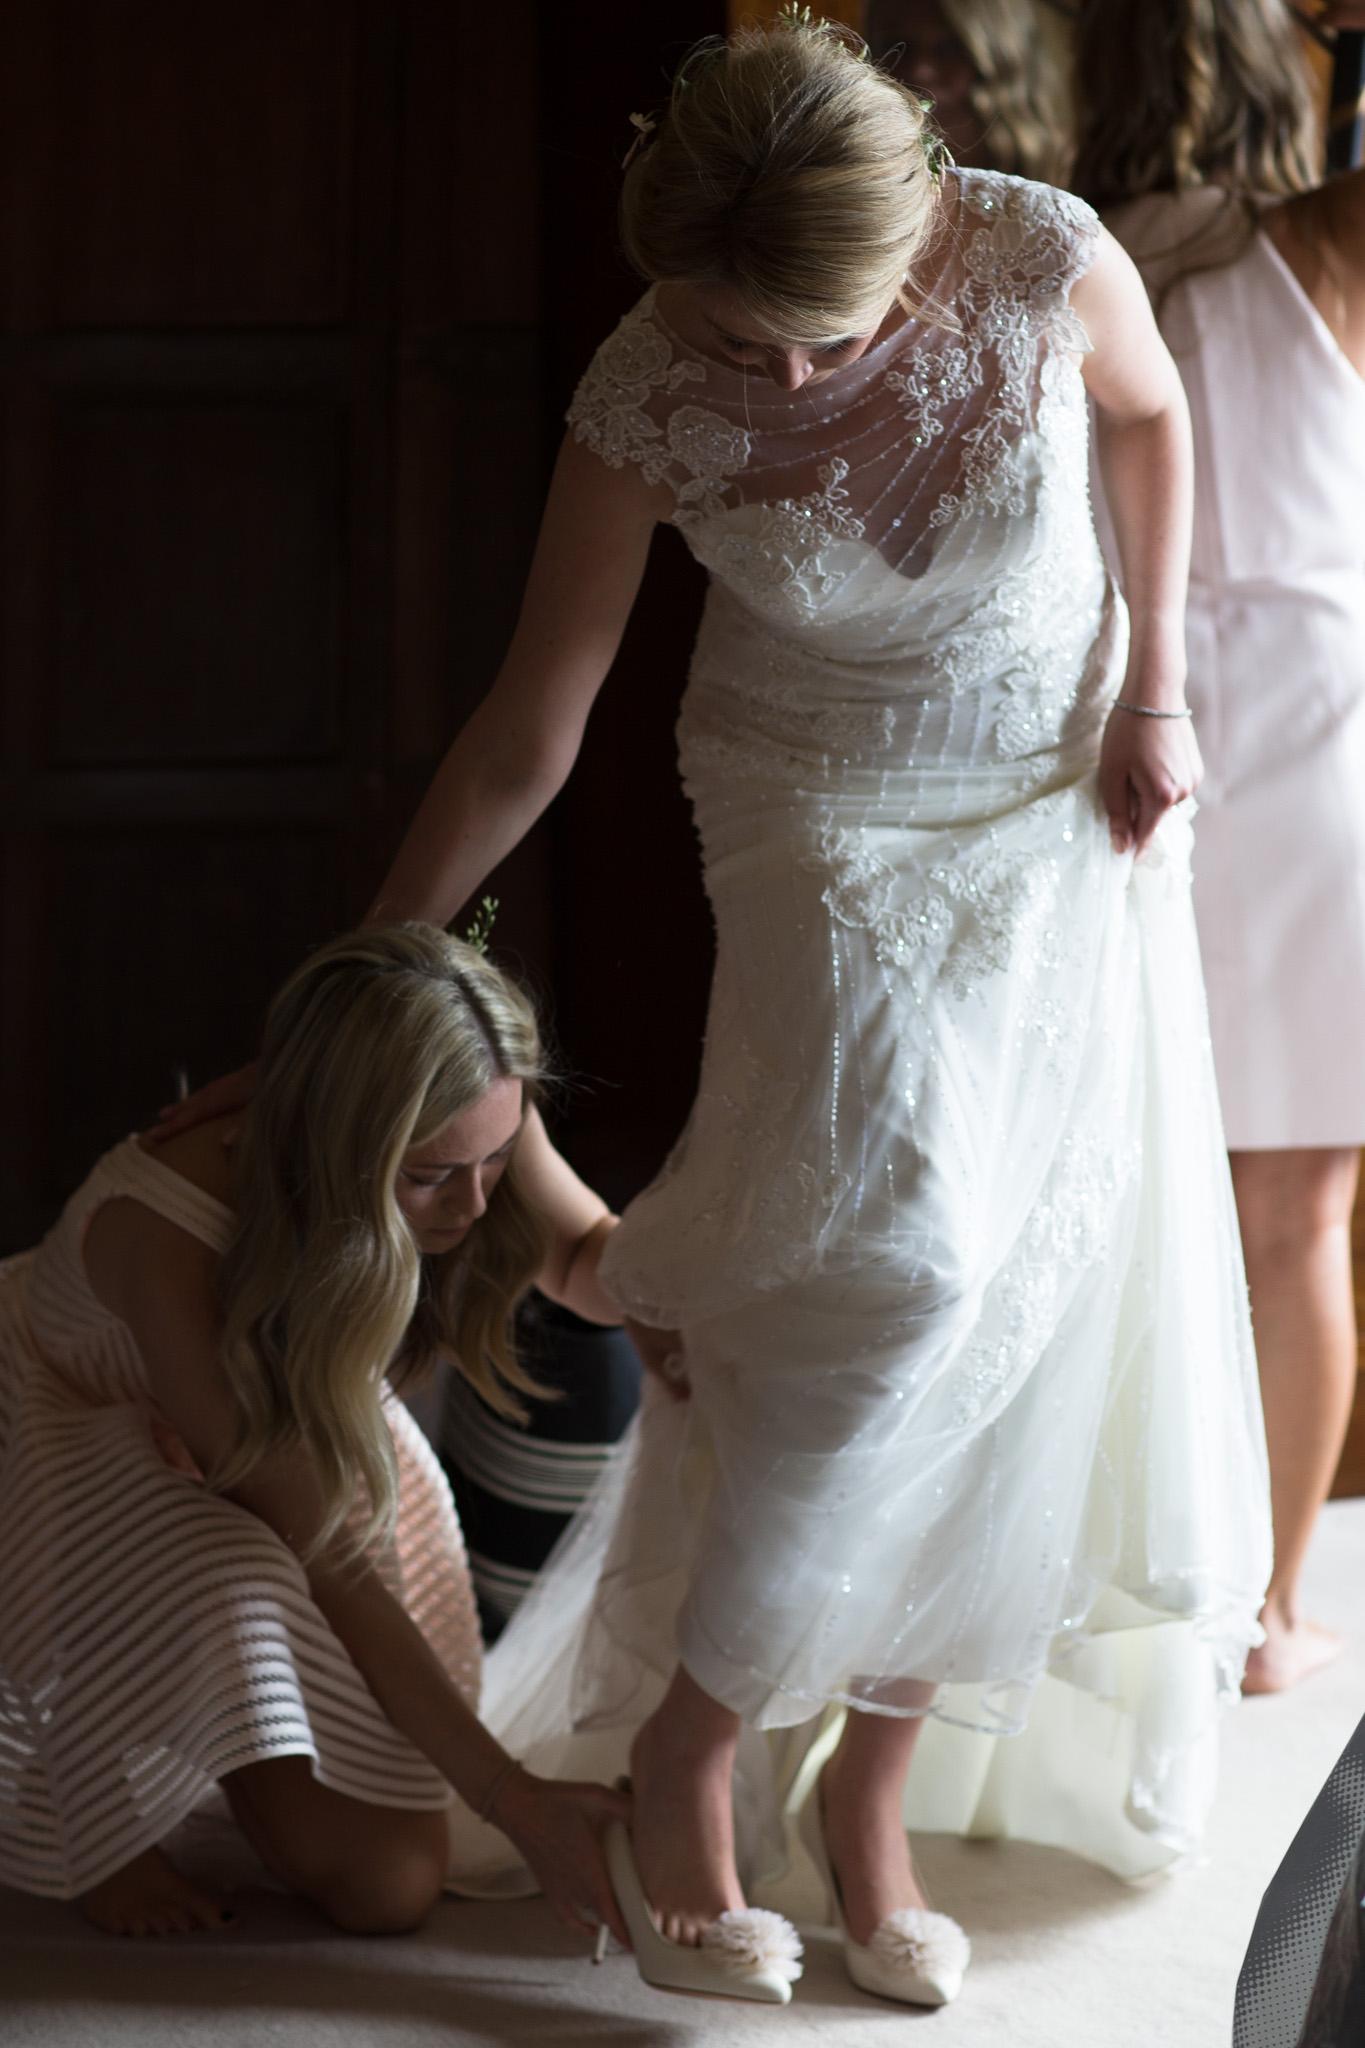 Mark_Barnes_Gloucester_Wedding_Photographer_Elmore_Court_Wedding_Photography_Mike+Kelly-16.jpg